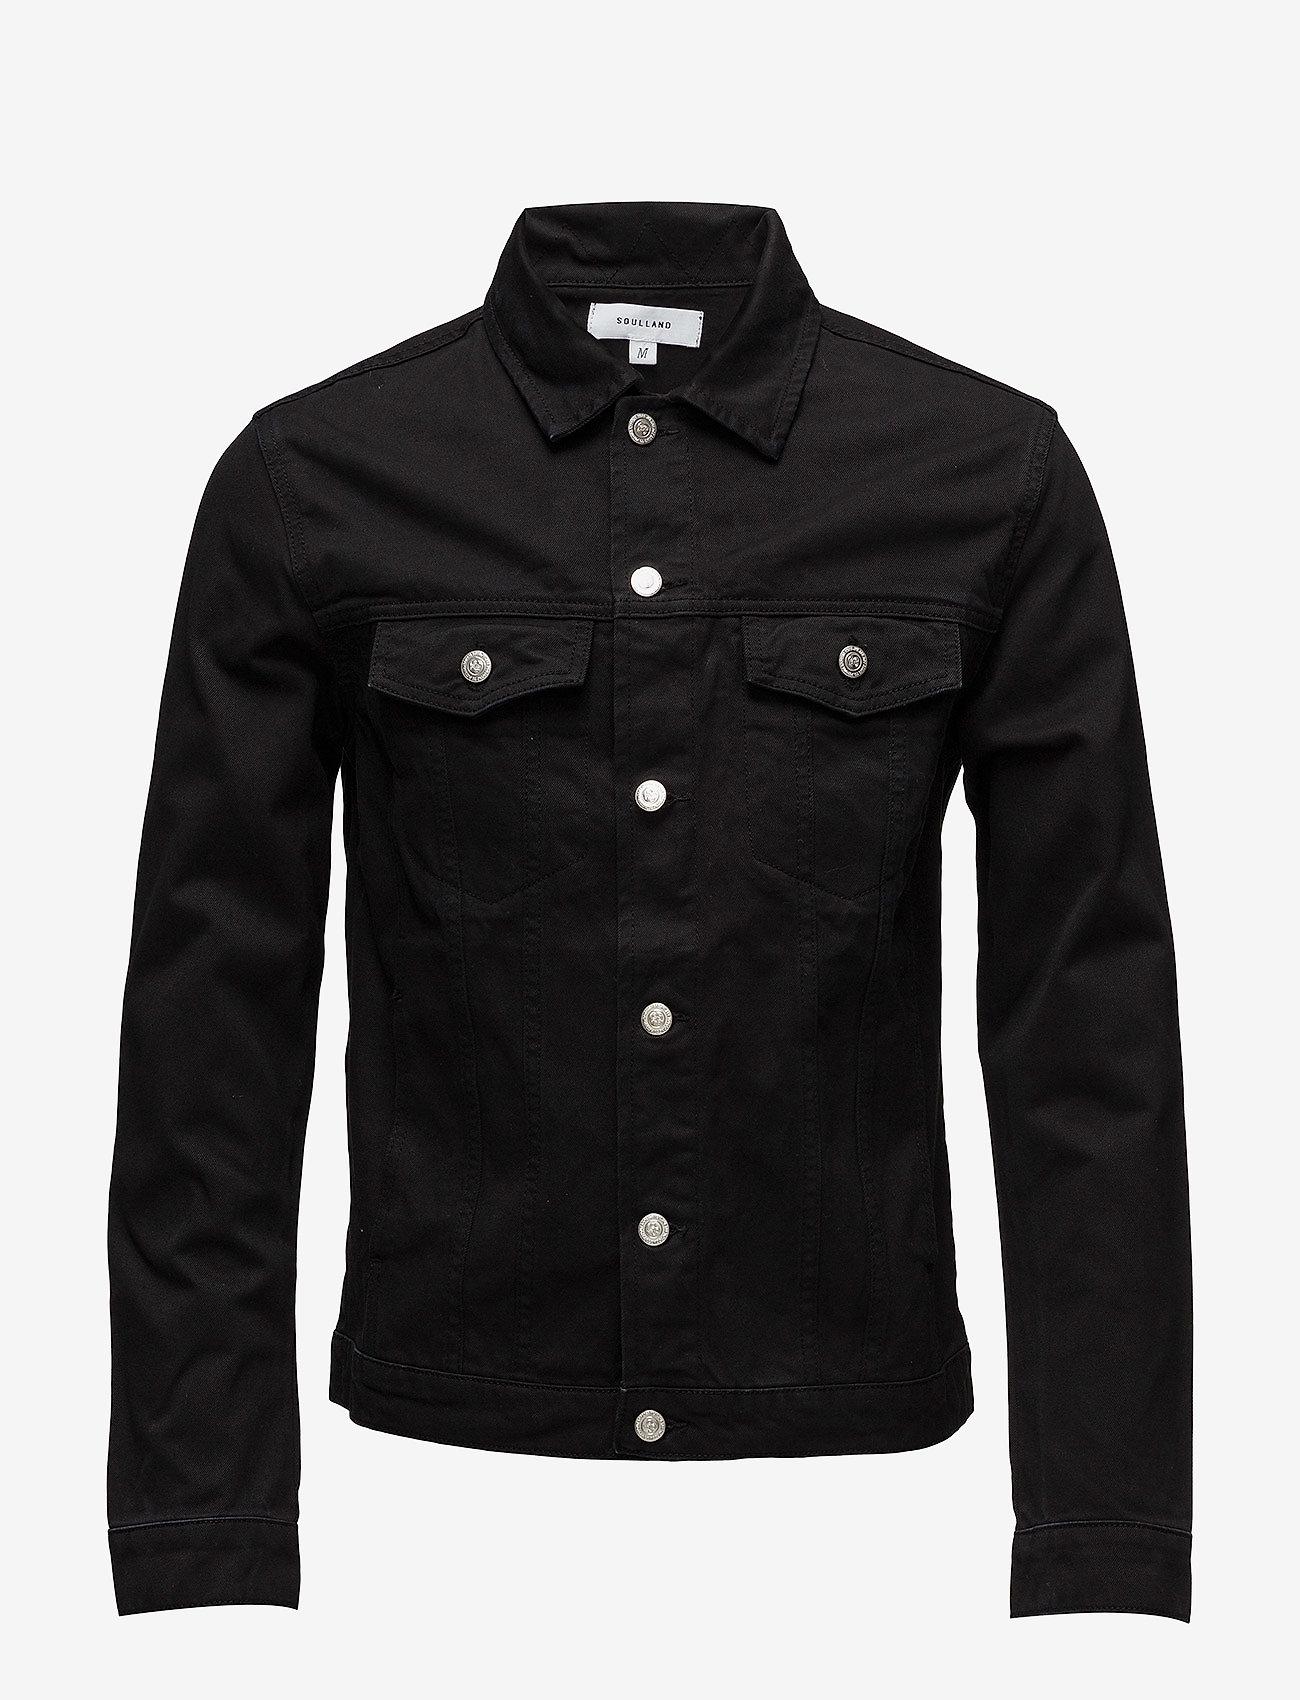 Soulland - SHELTON  DENIM JACKET - kurtki dżinsowe - black - 0